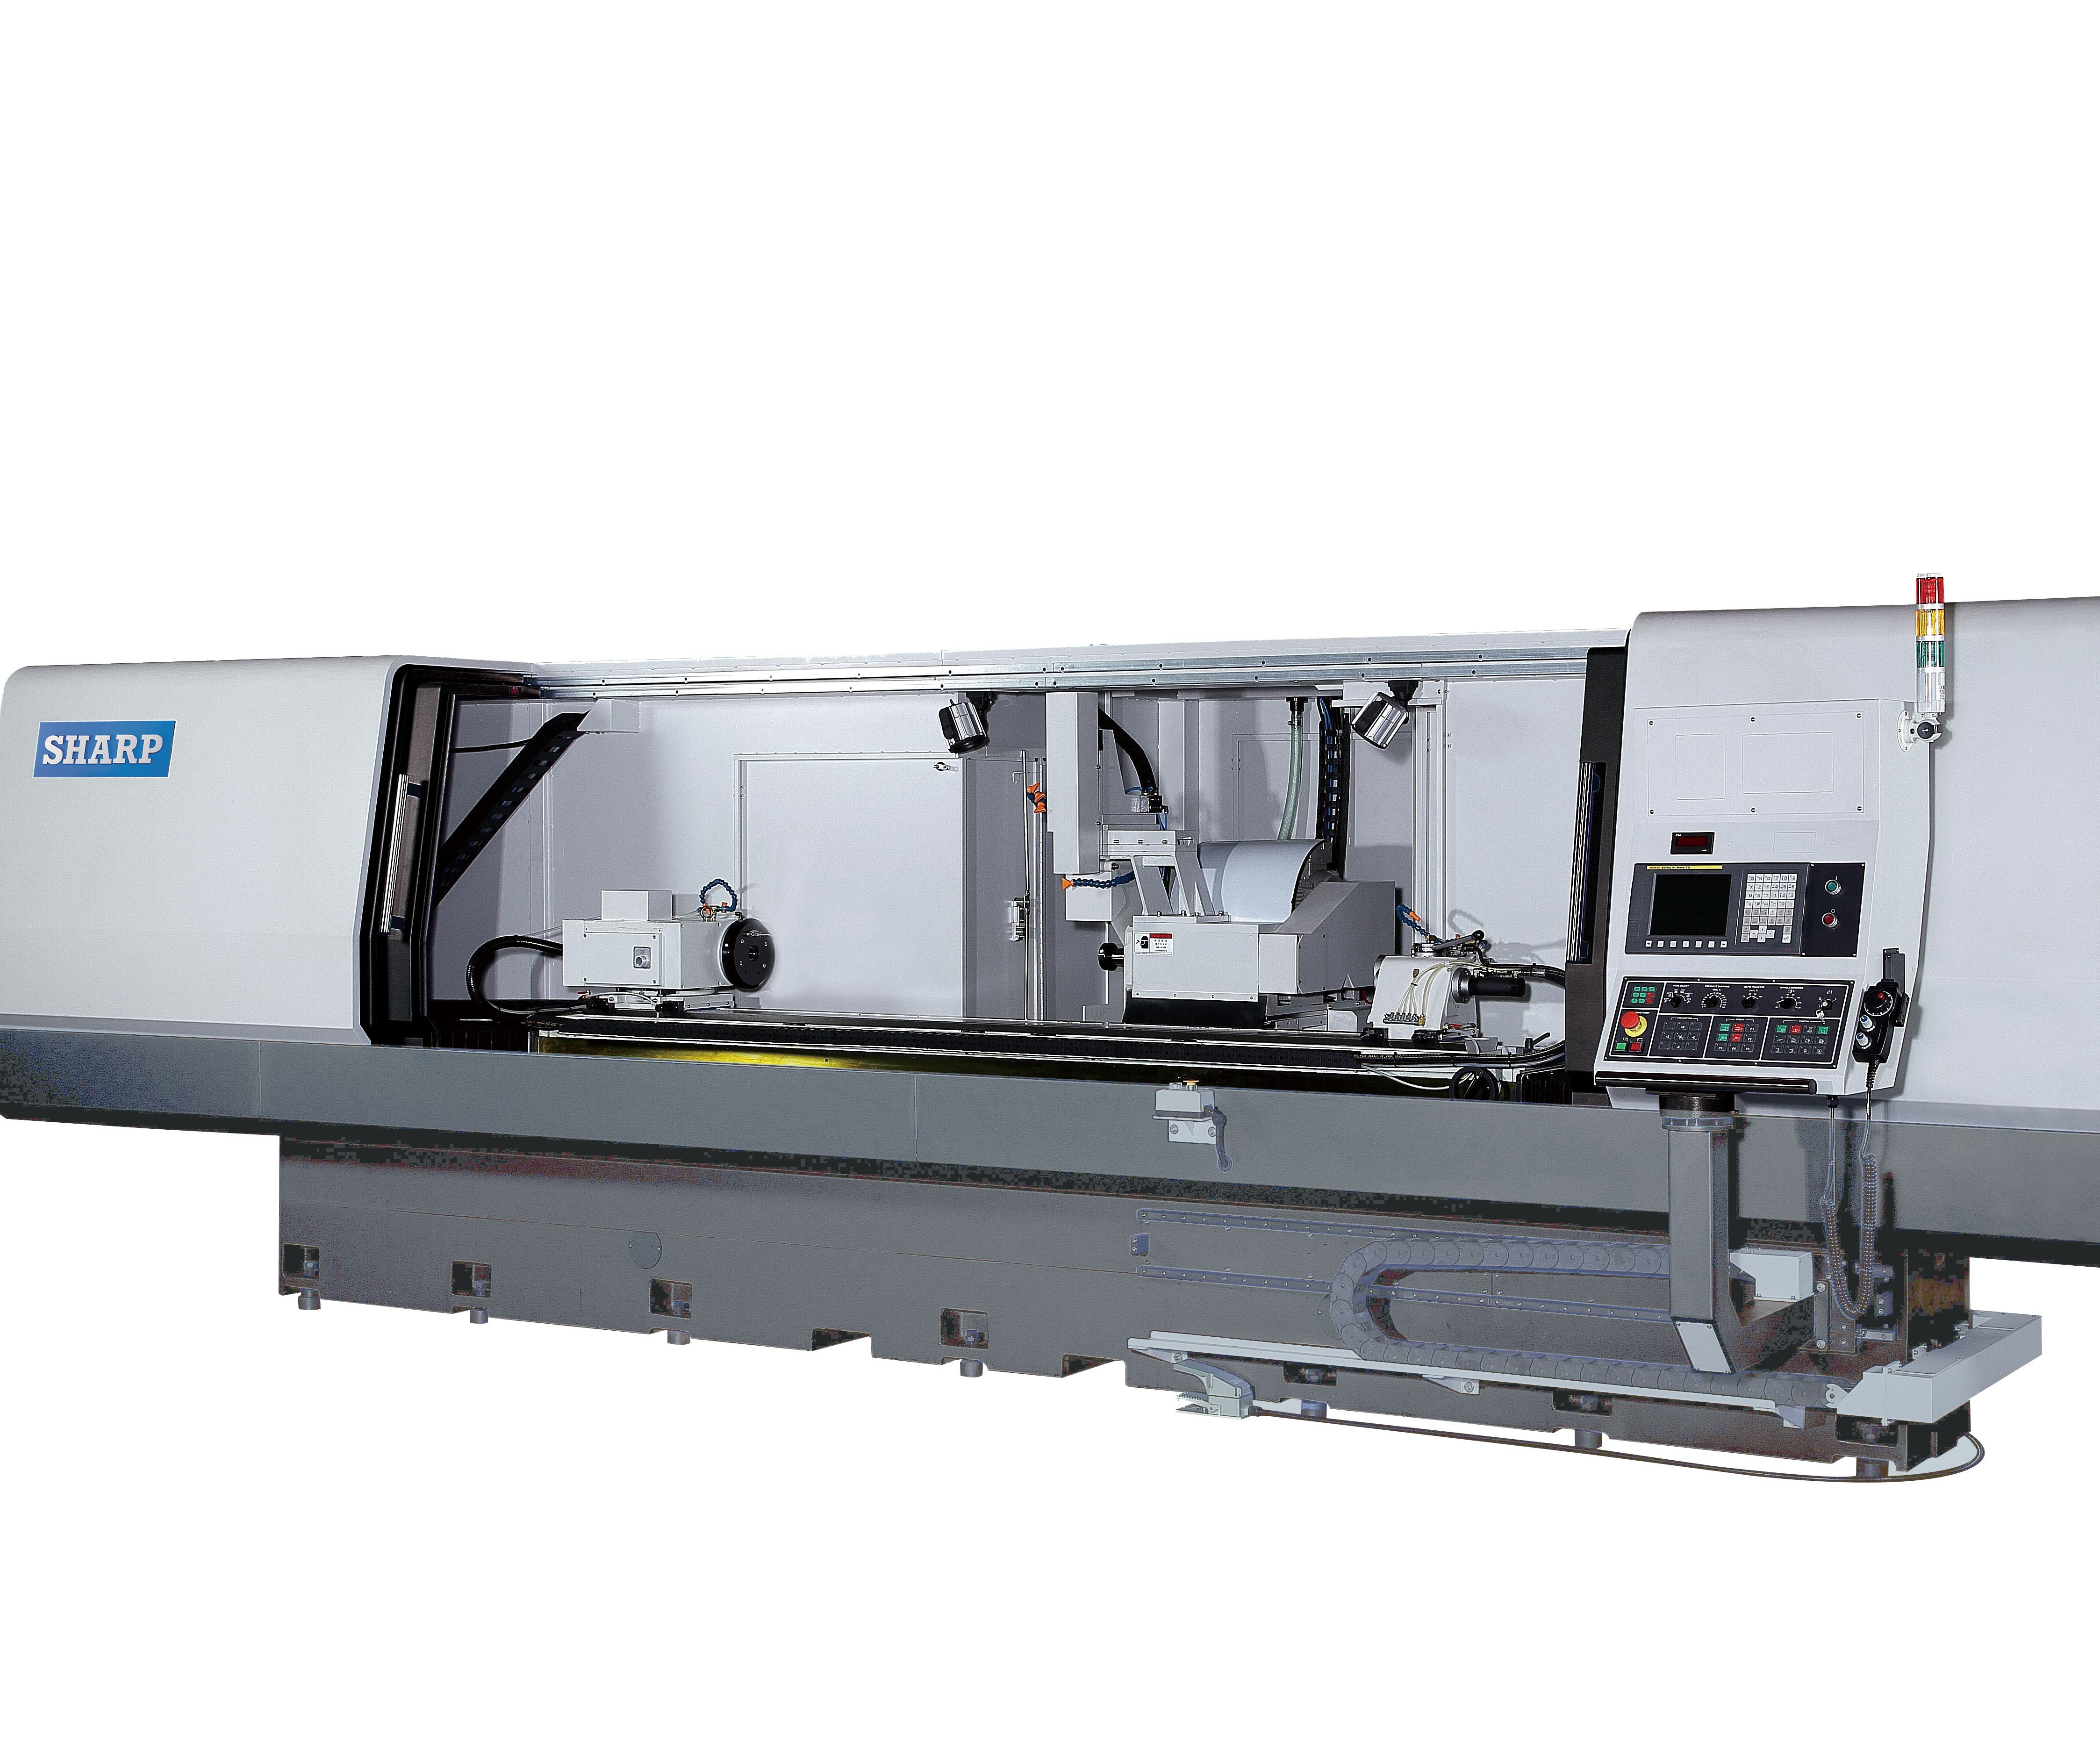 Sharp OD-1524X grinder